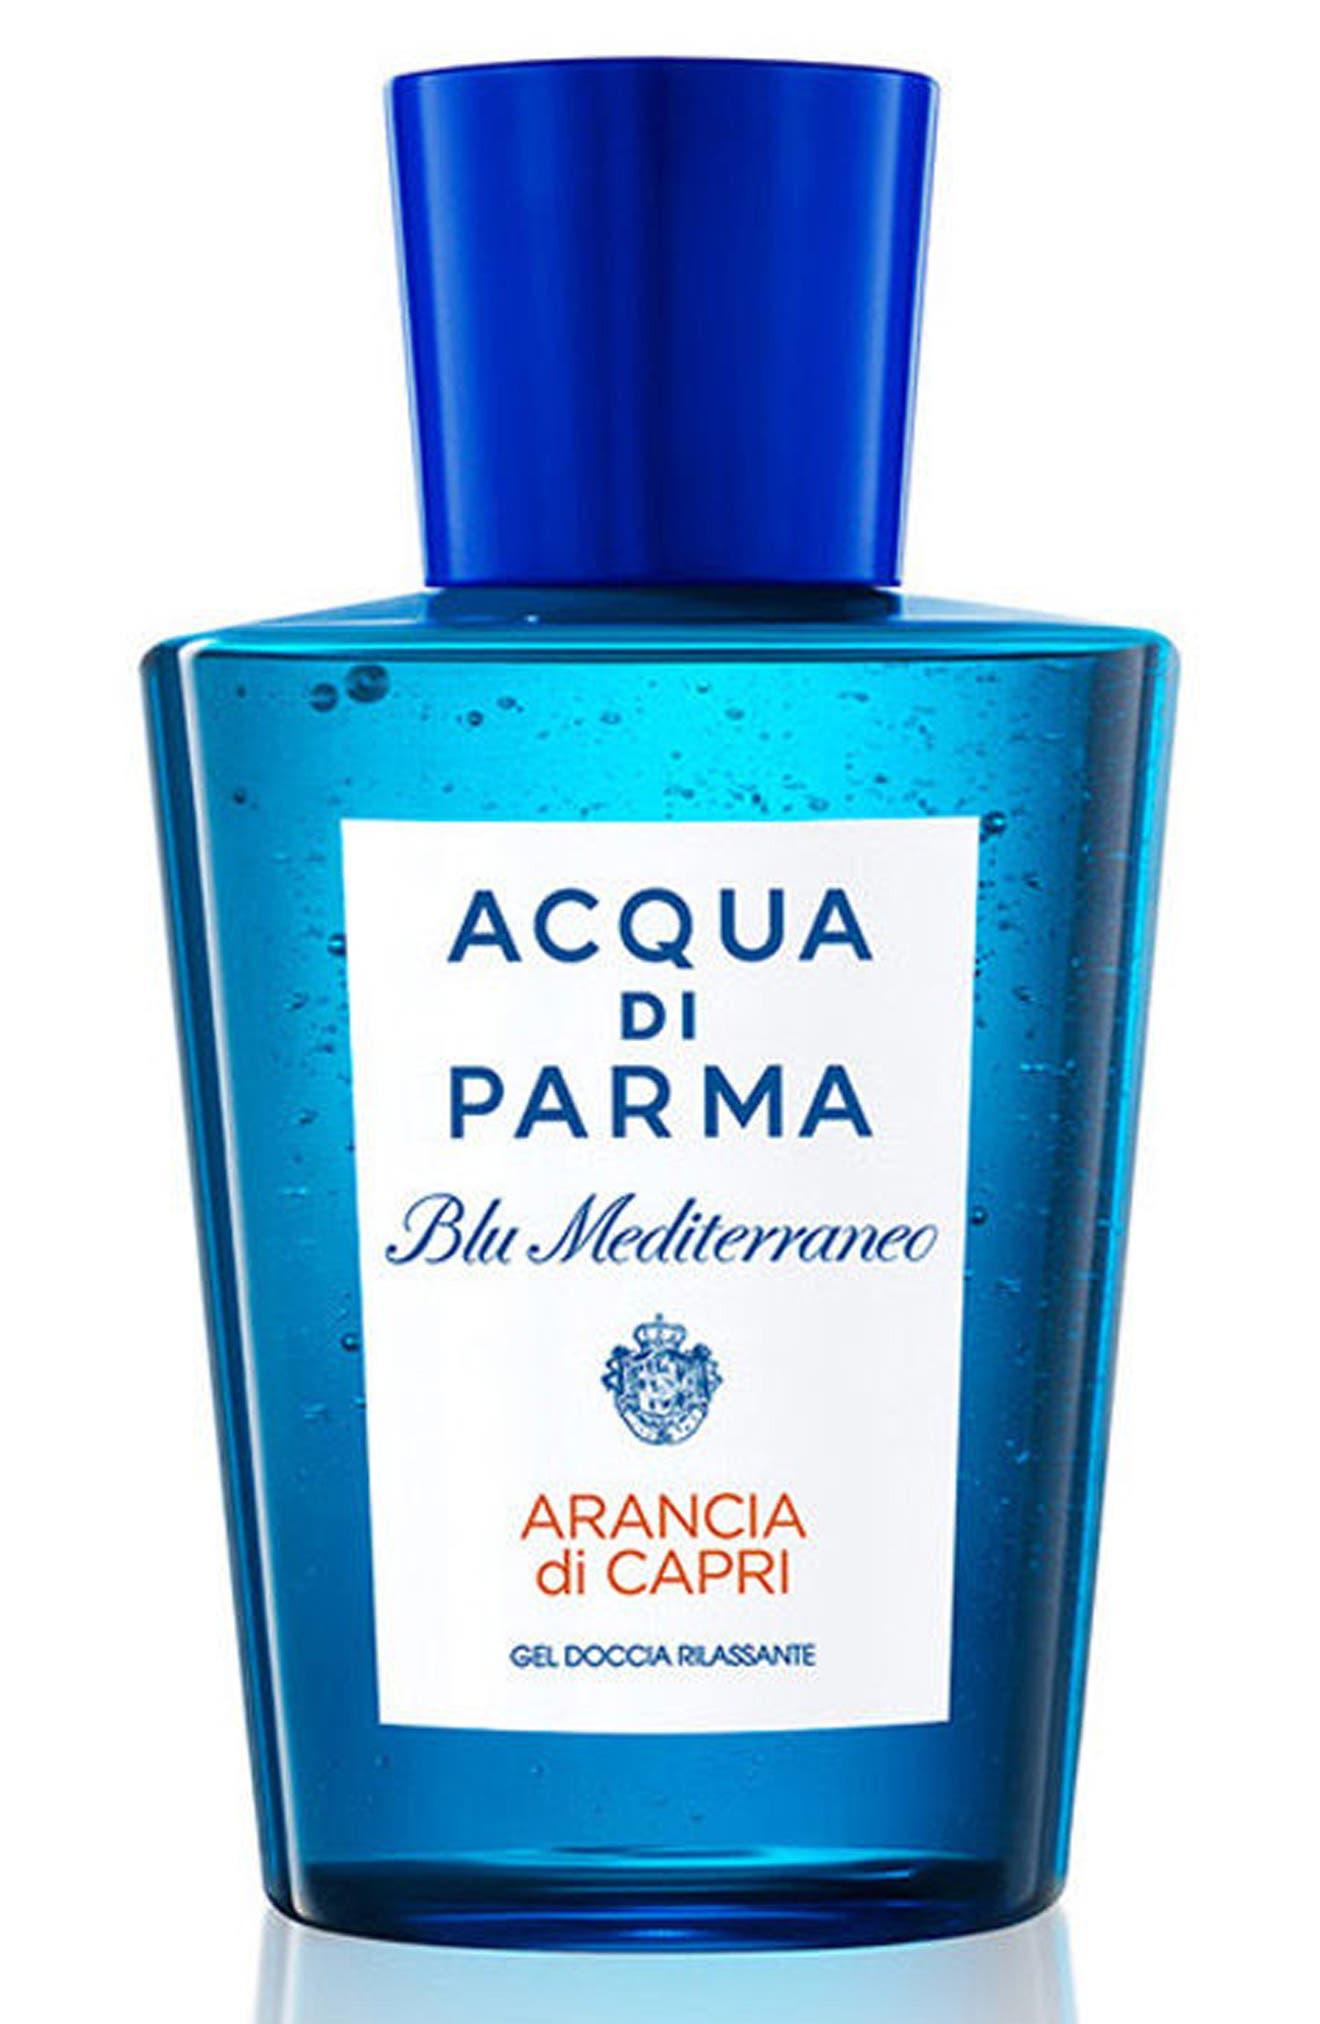 'Blu Mediterraneo